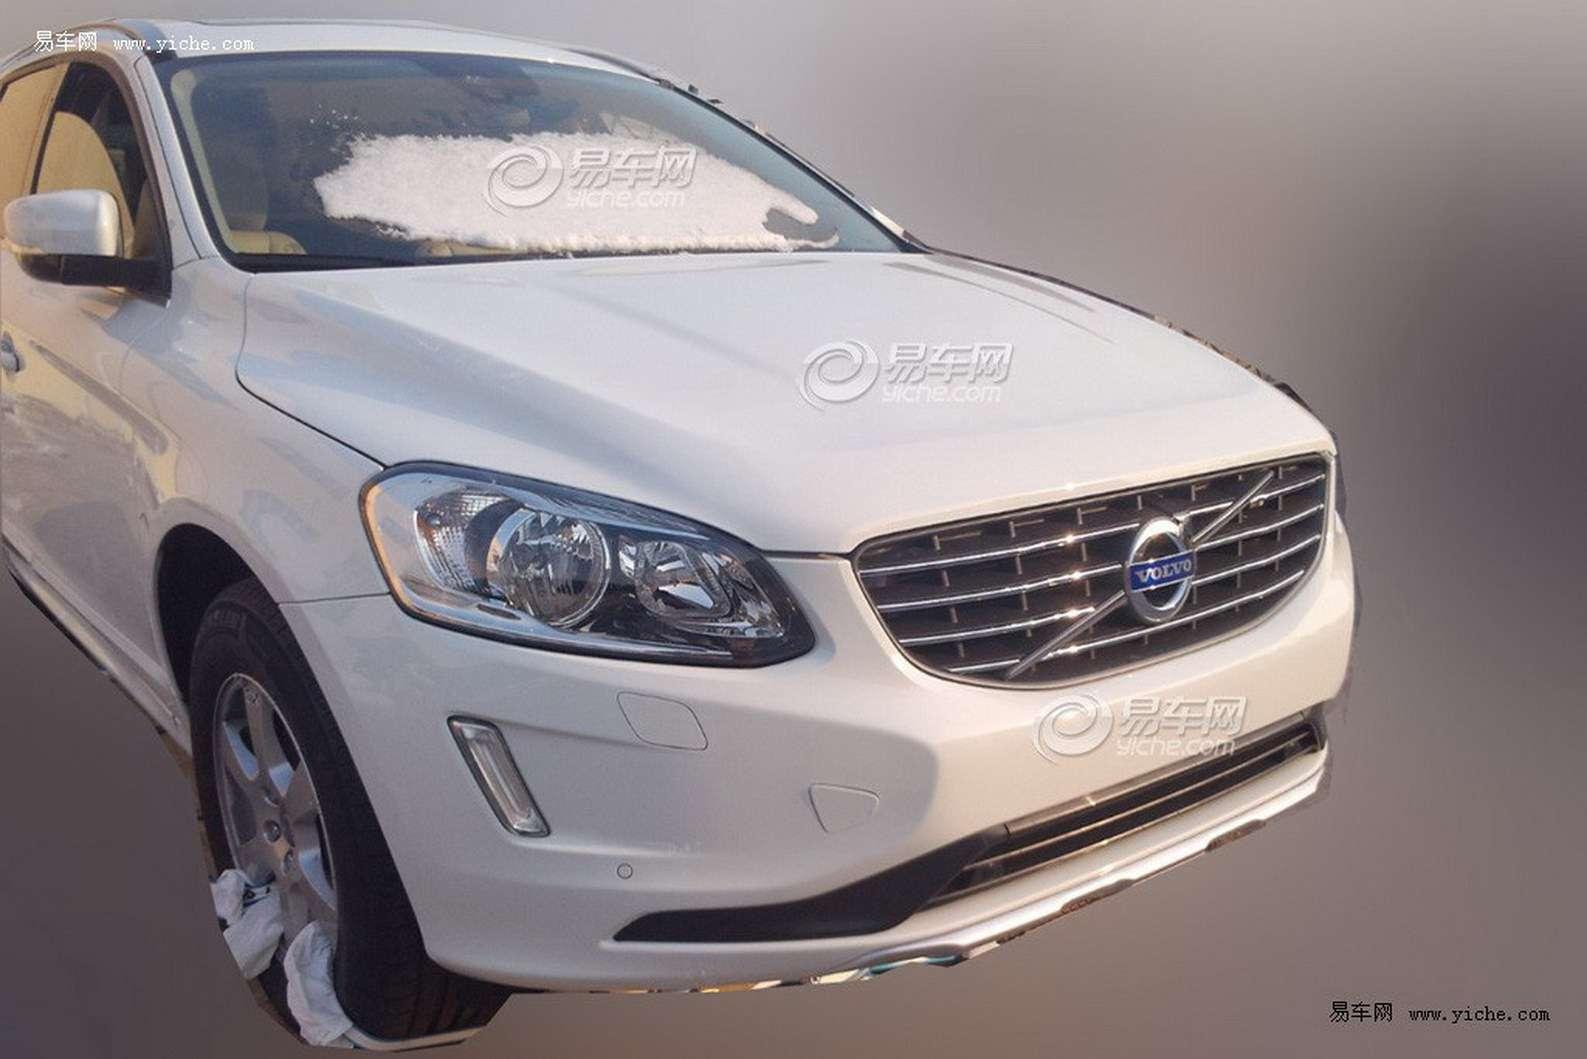 Volvo XC60 2014 facelifting